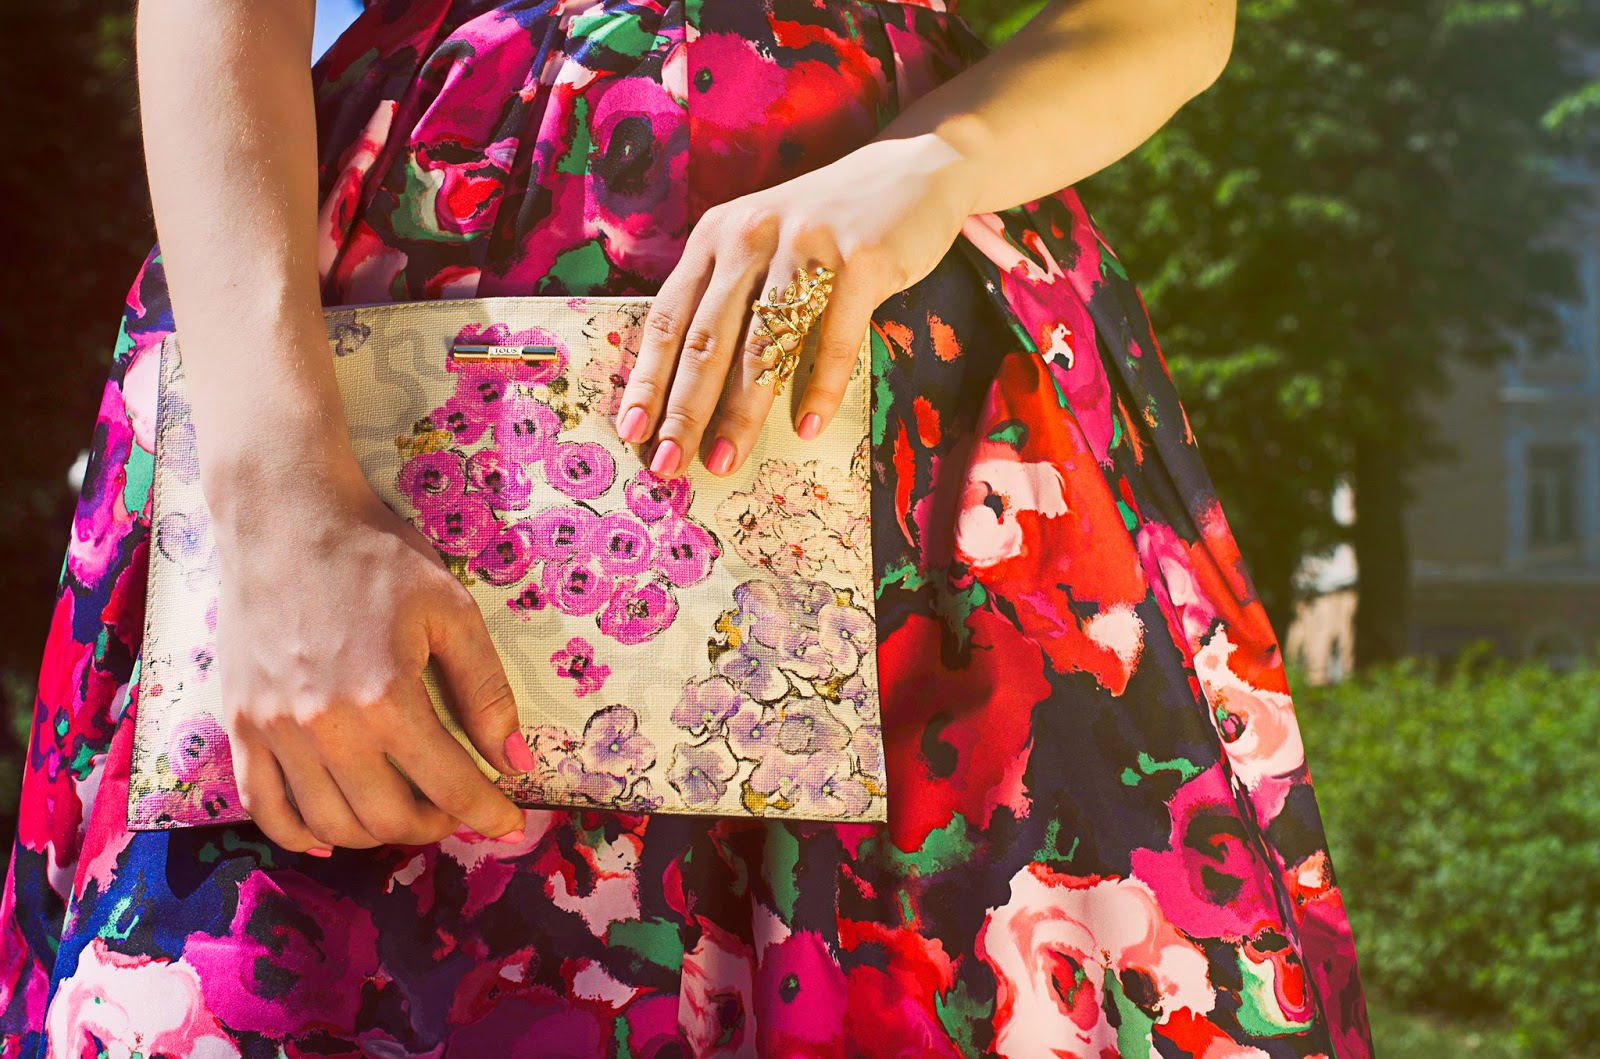 costa de la moda, summer style, summer look, summer dress, летний лук,лучший лук